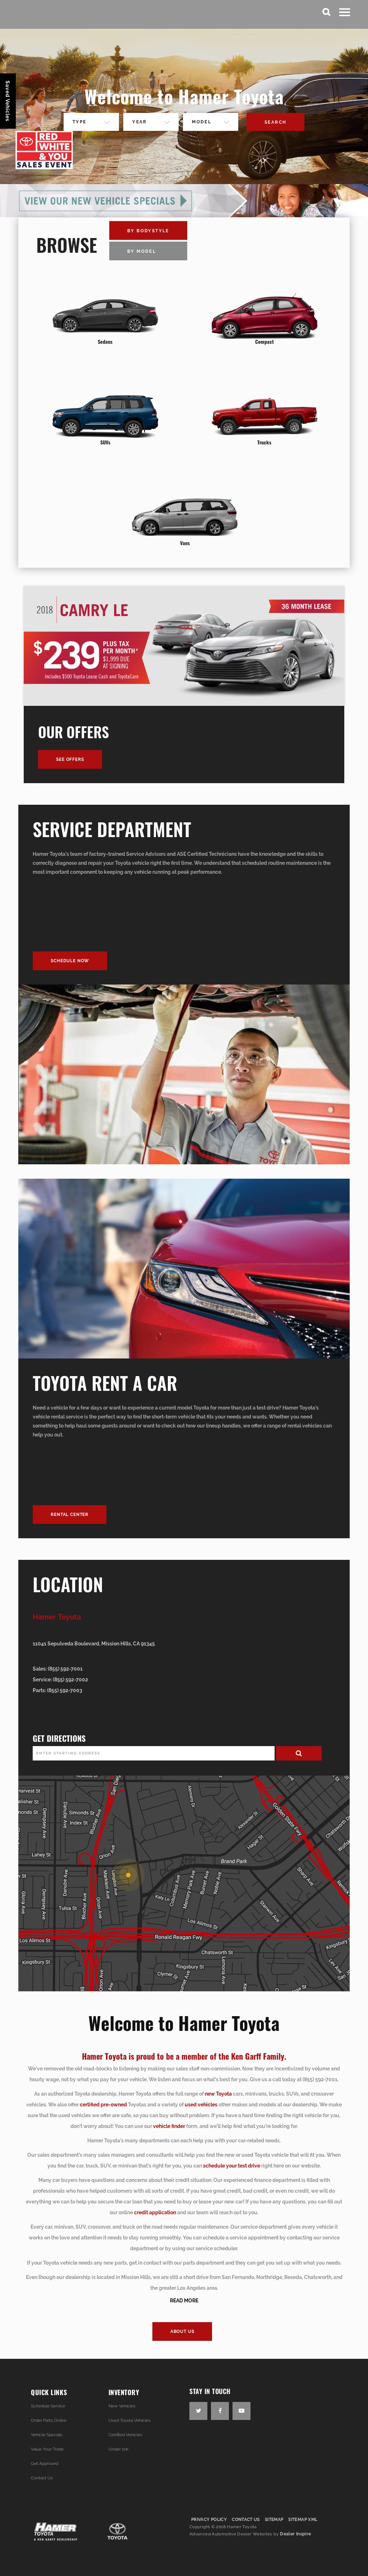 Hamer Toyota Website History